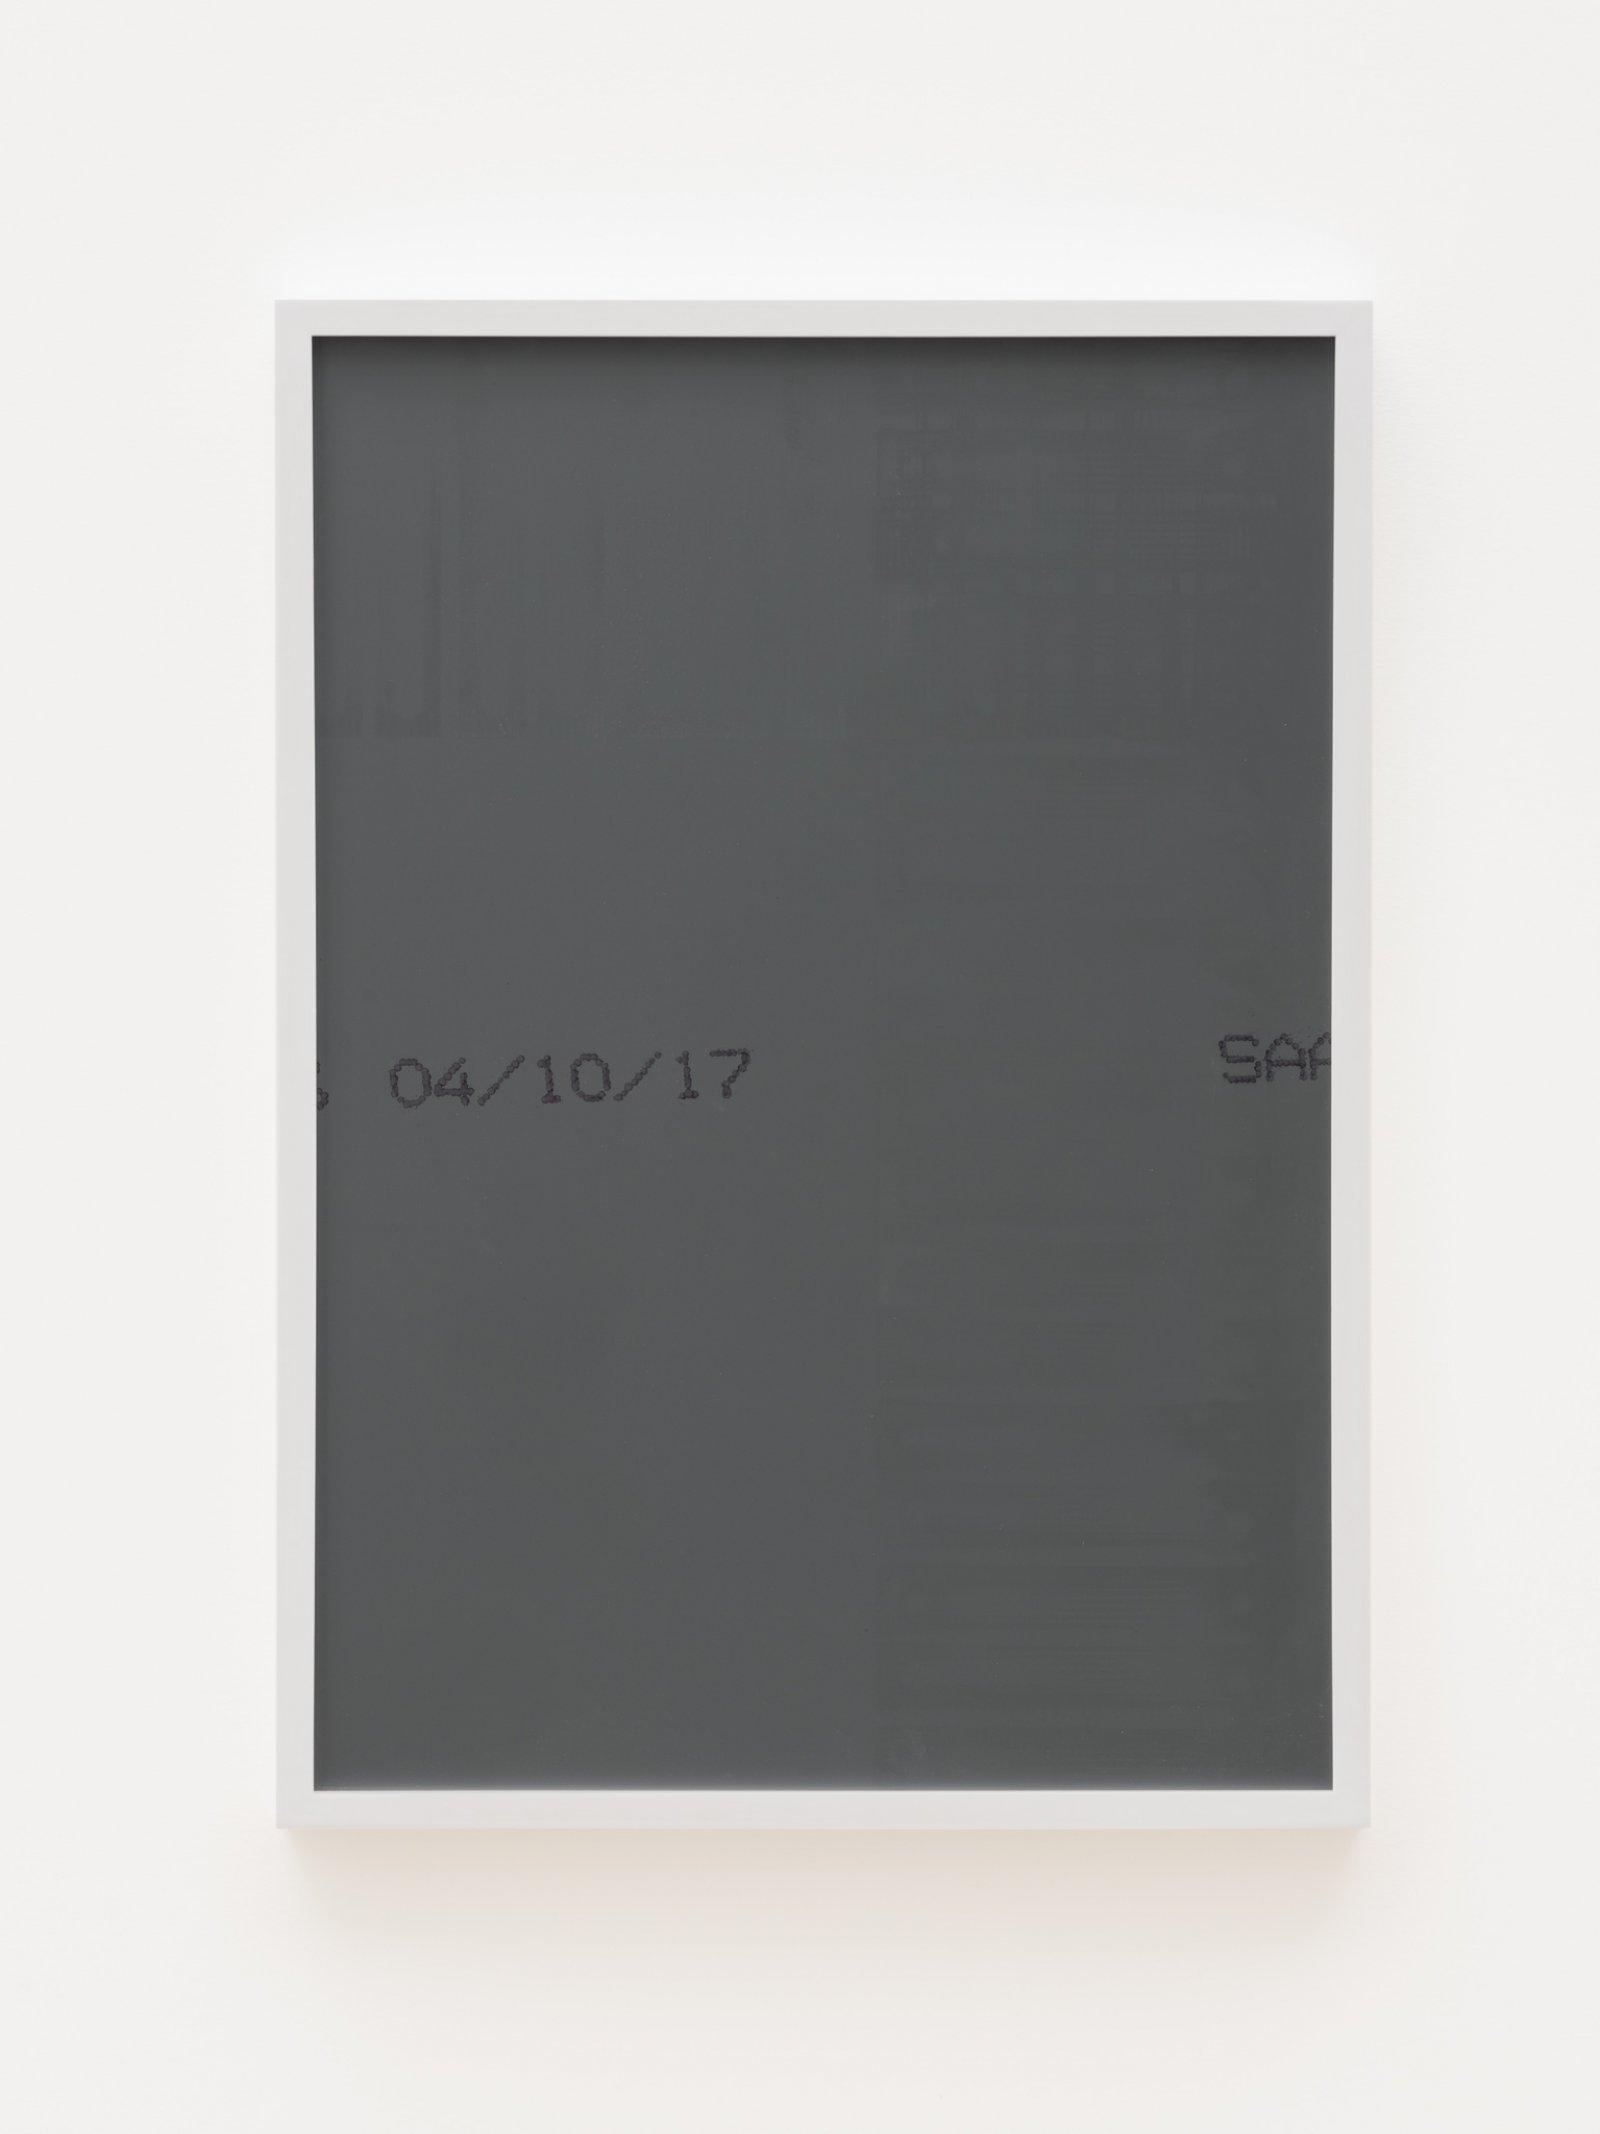 Abbas Akhavan, Untitled (animal selfie), 2017, colour digital print on archival paper, mirror, frame, 29 x 21 in. (74 x 53 cm) by Abbas Akhavan